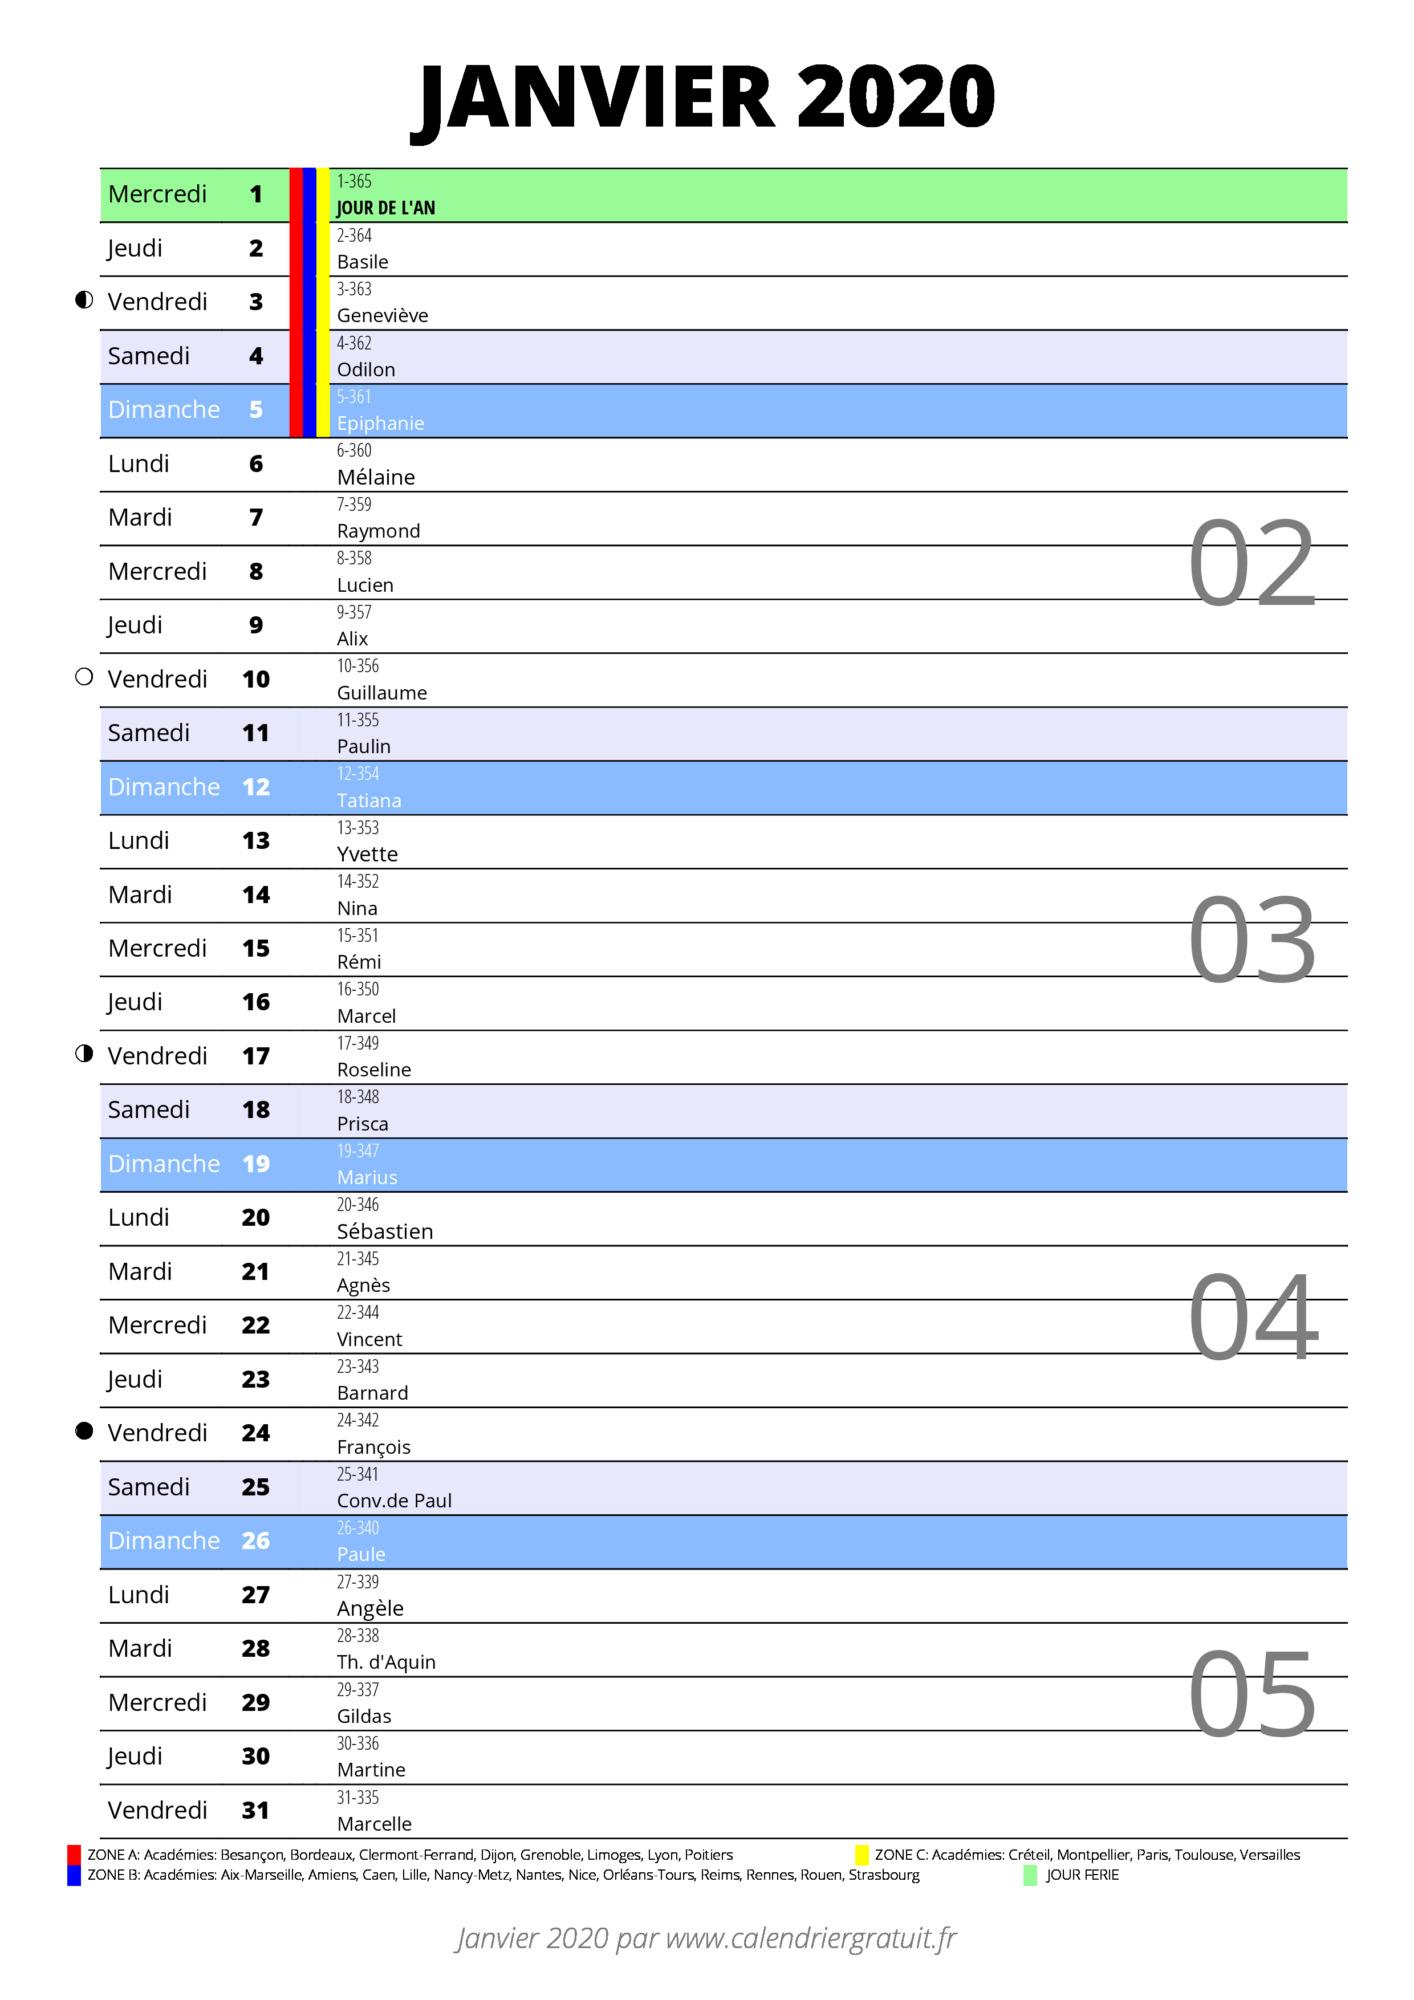 Calendrier 2020 Format Excel.Calendrier Janvier 2020 A Imprimer